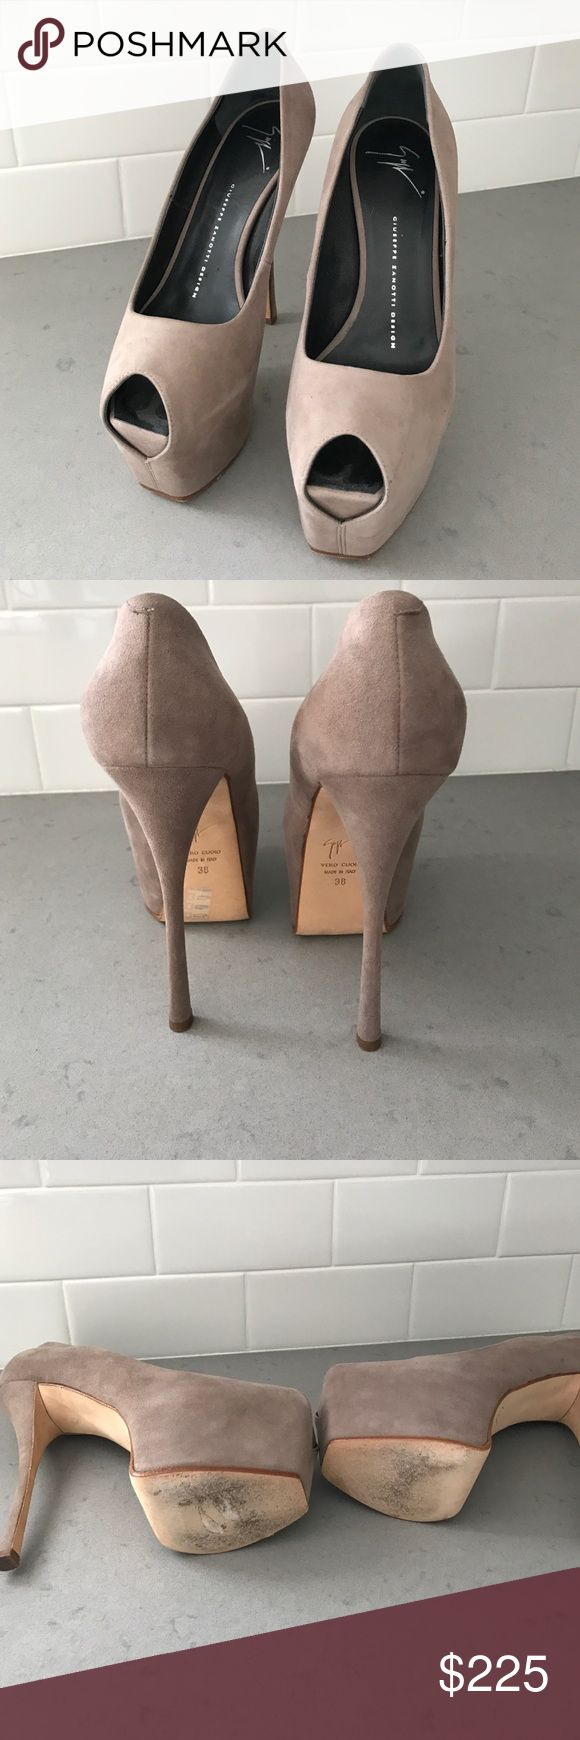 Giuseppe Zanotti Shoes Beautiful taupe suede platform peep toe heels. guiseppe zanotti Shoes Platforms